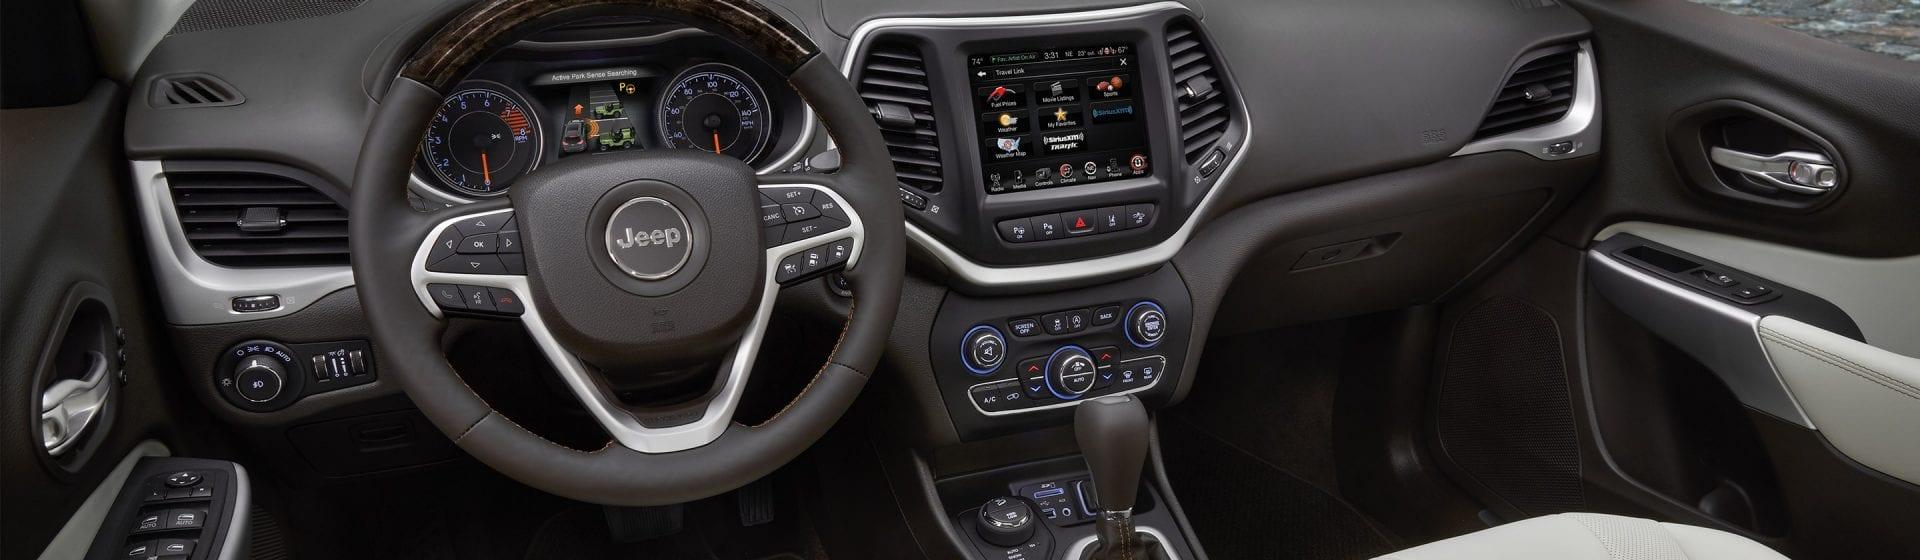 2017 Jeep Cherokee interior